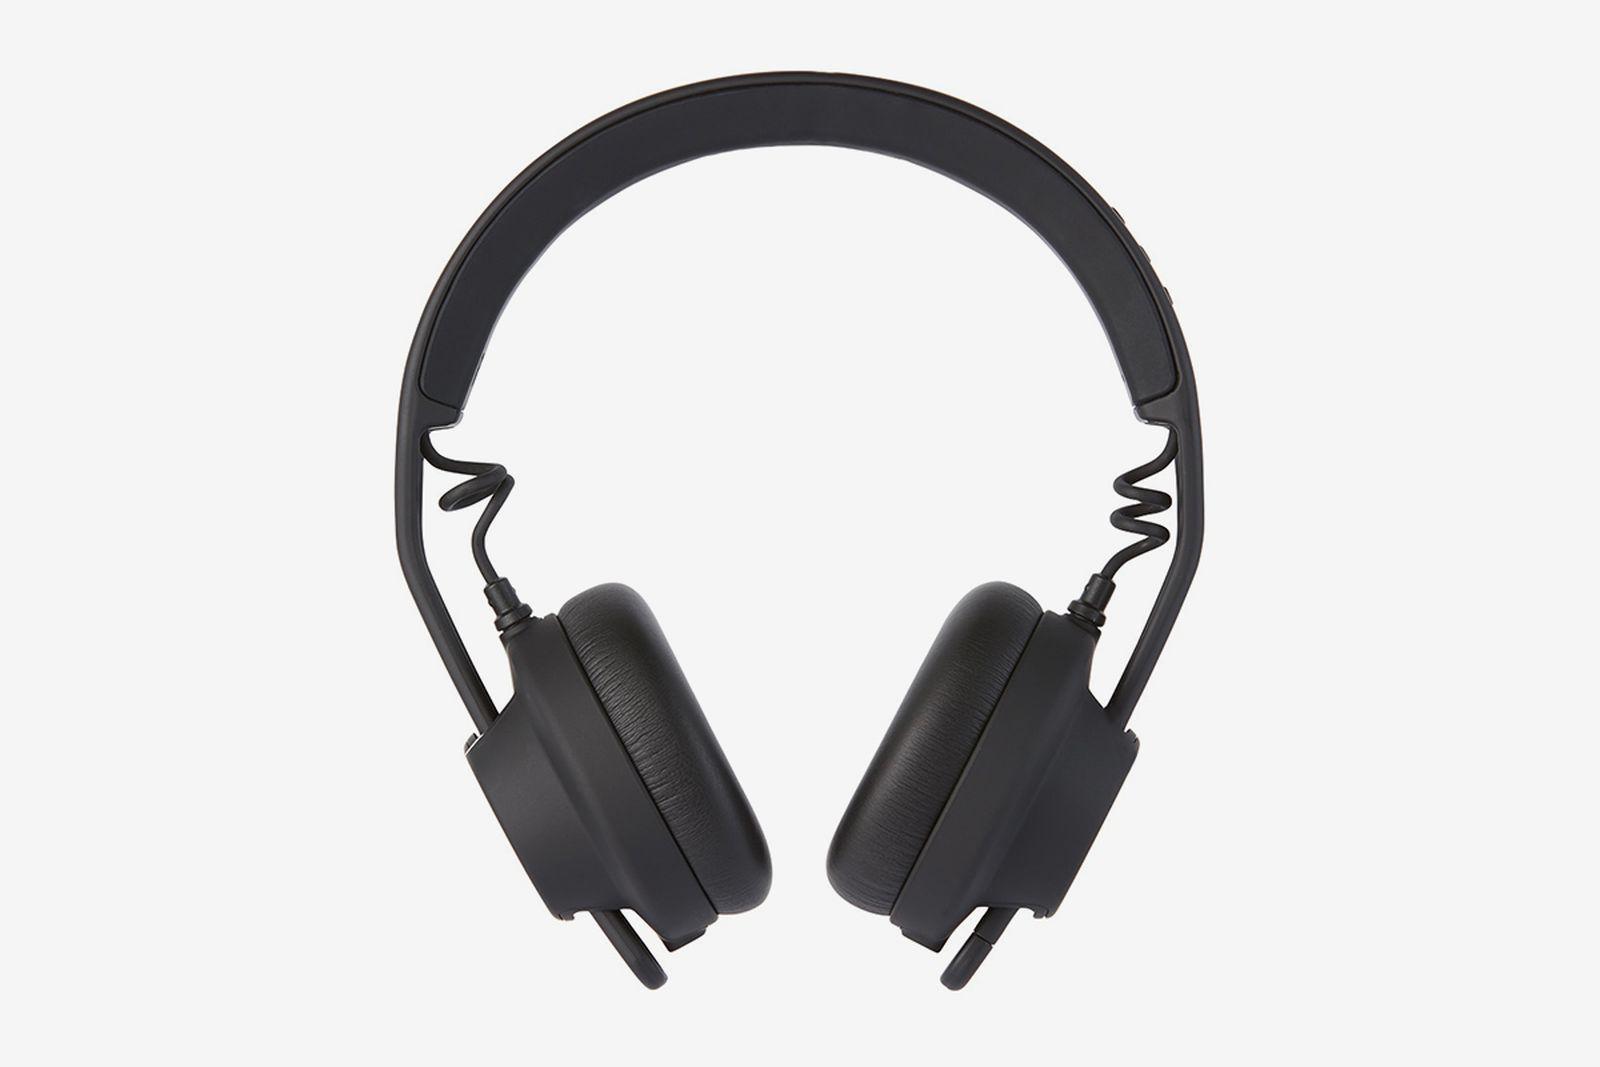 aiaiai-black-wireless-tma-2-move-headphones